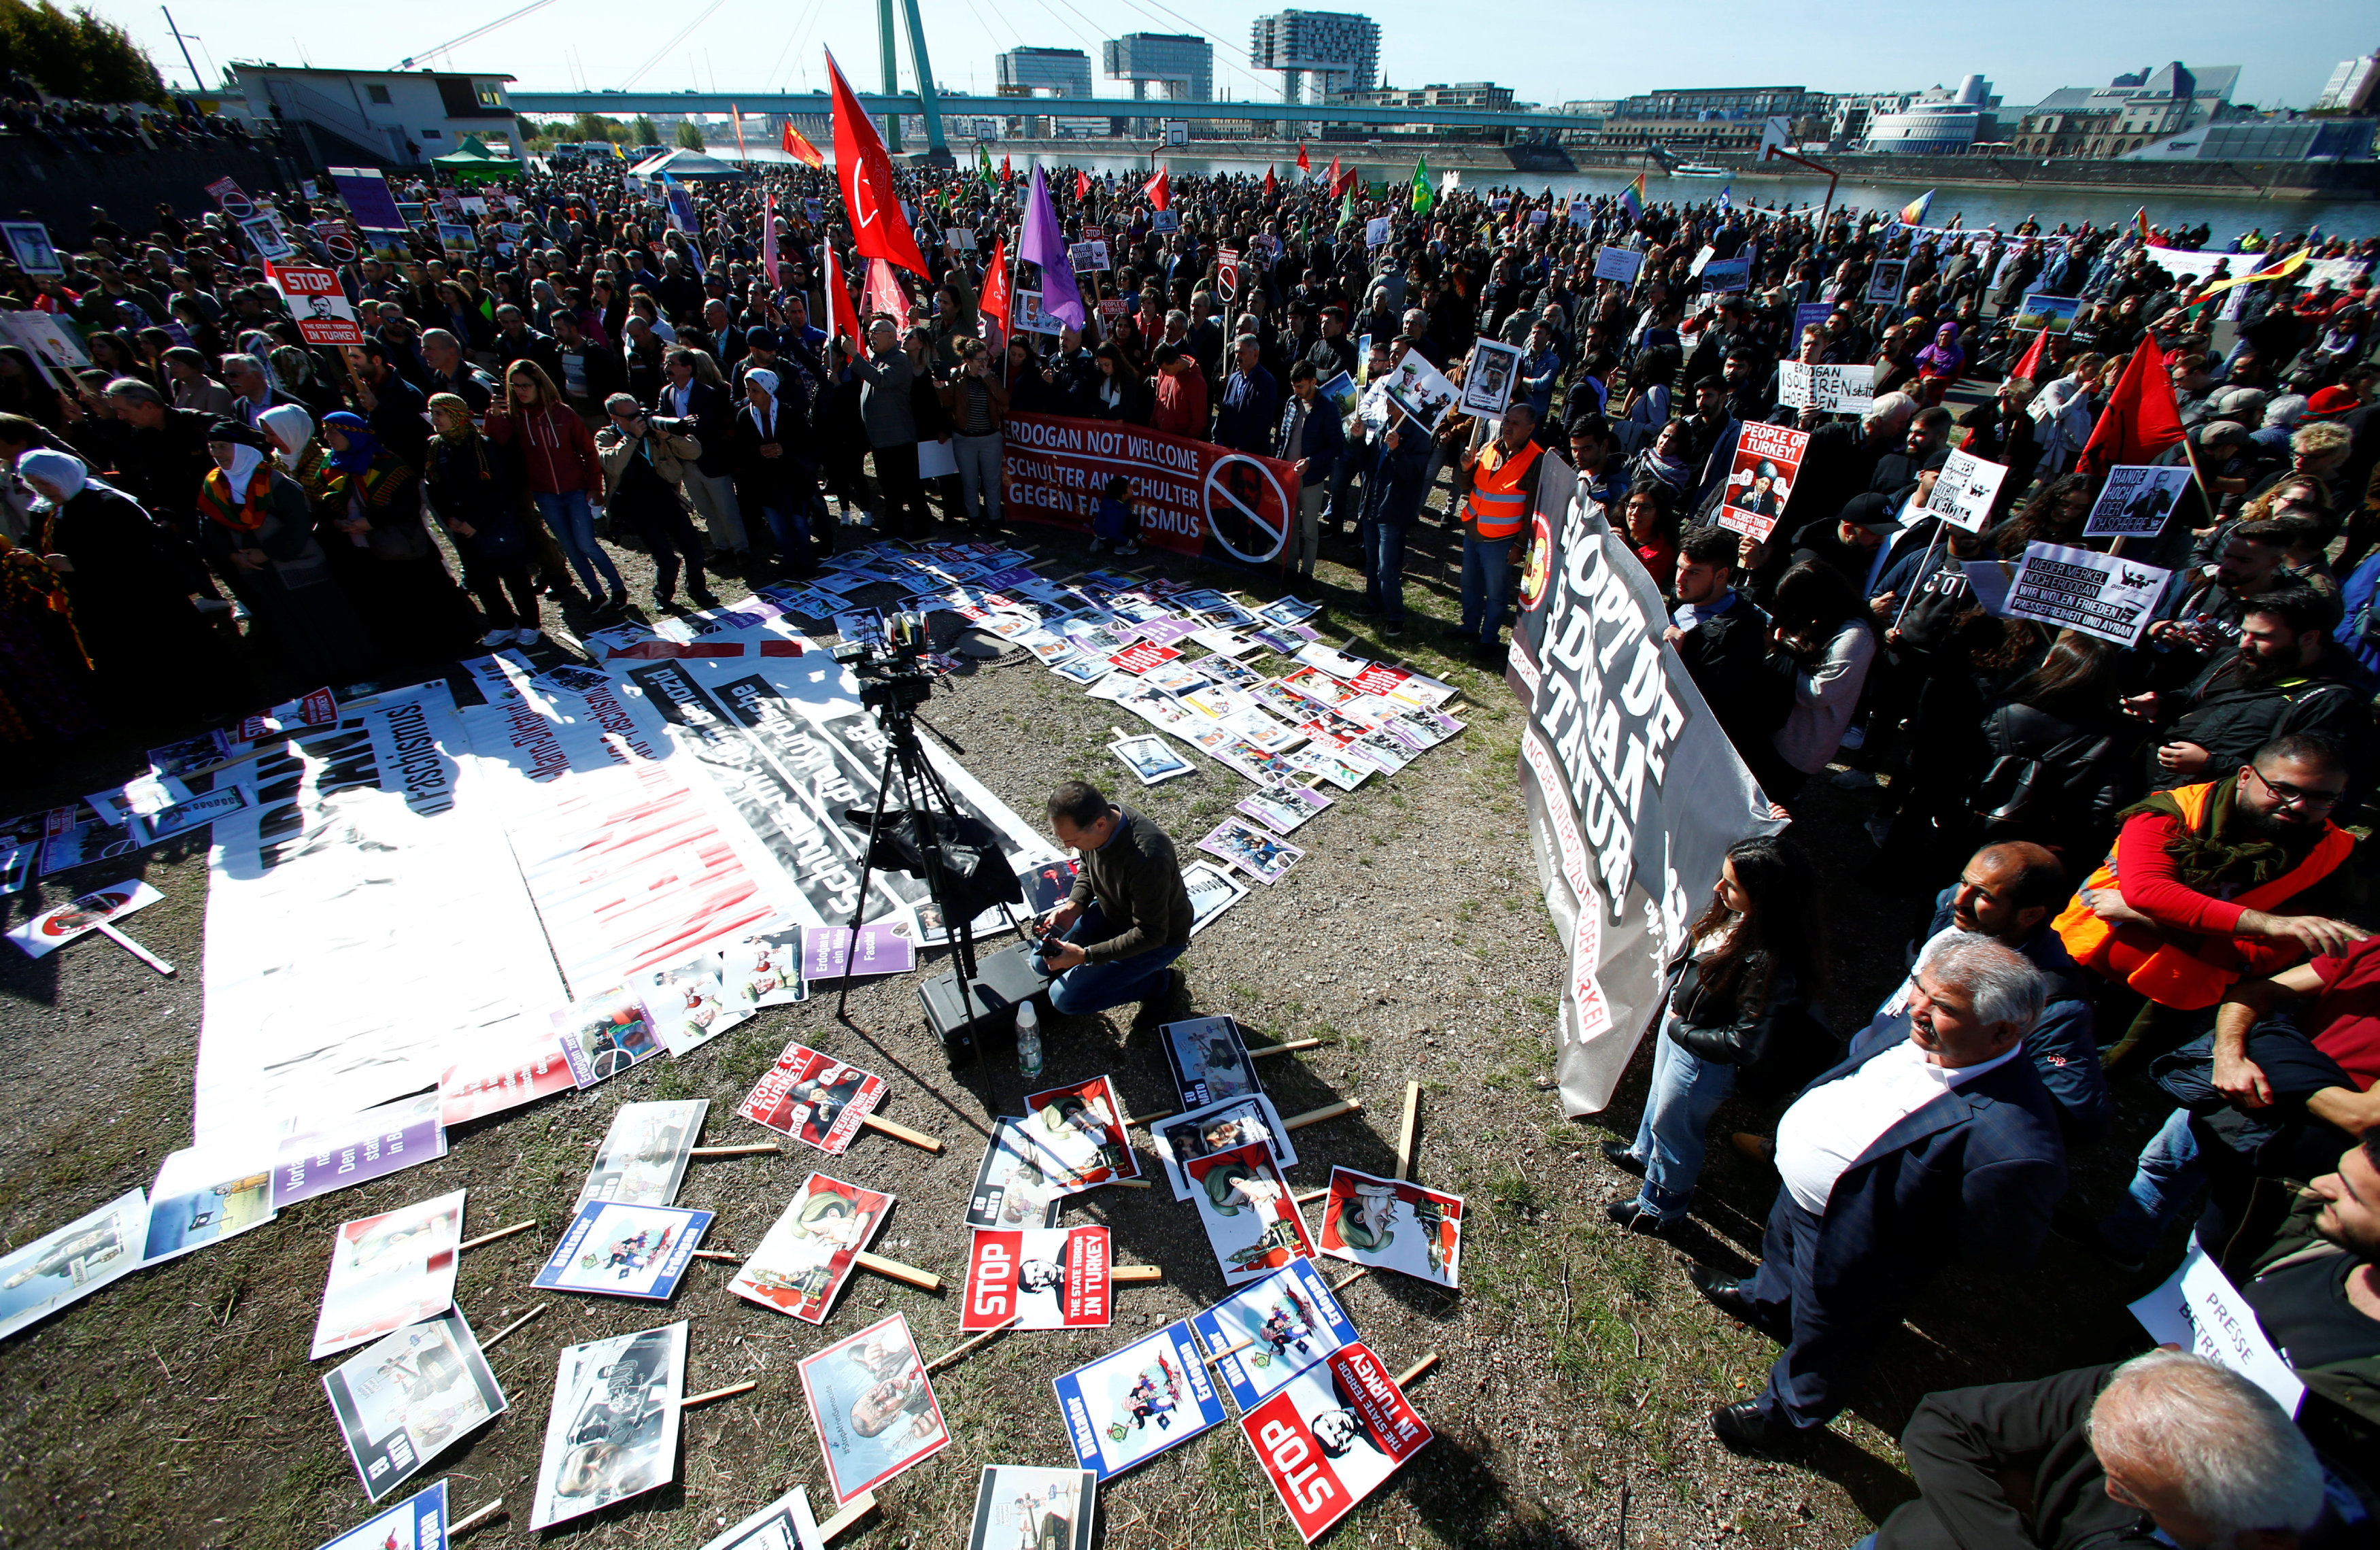 تظاهرات ضد زيارة اردوغان لالمانيا